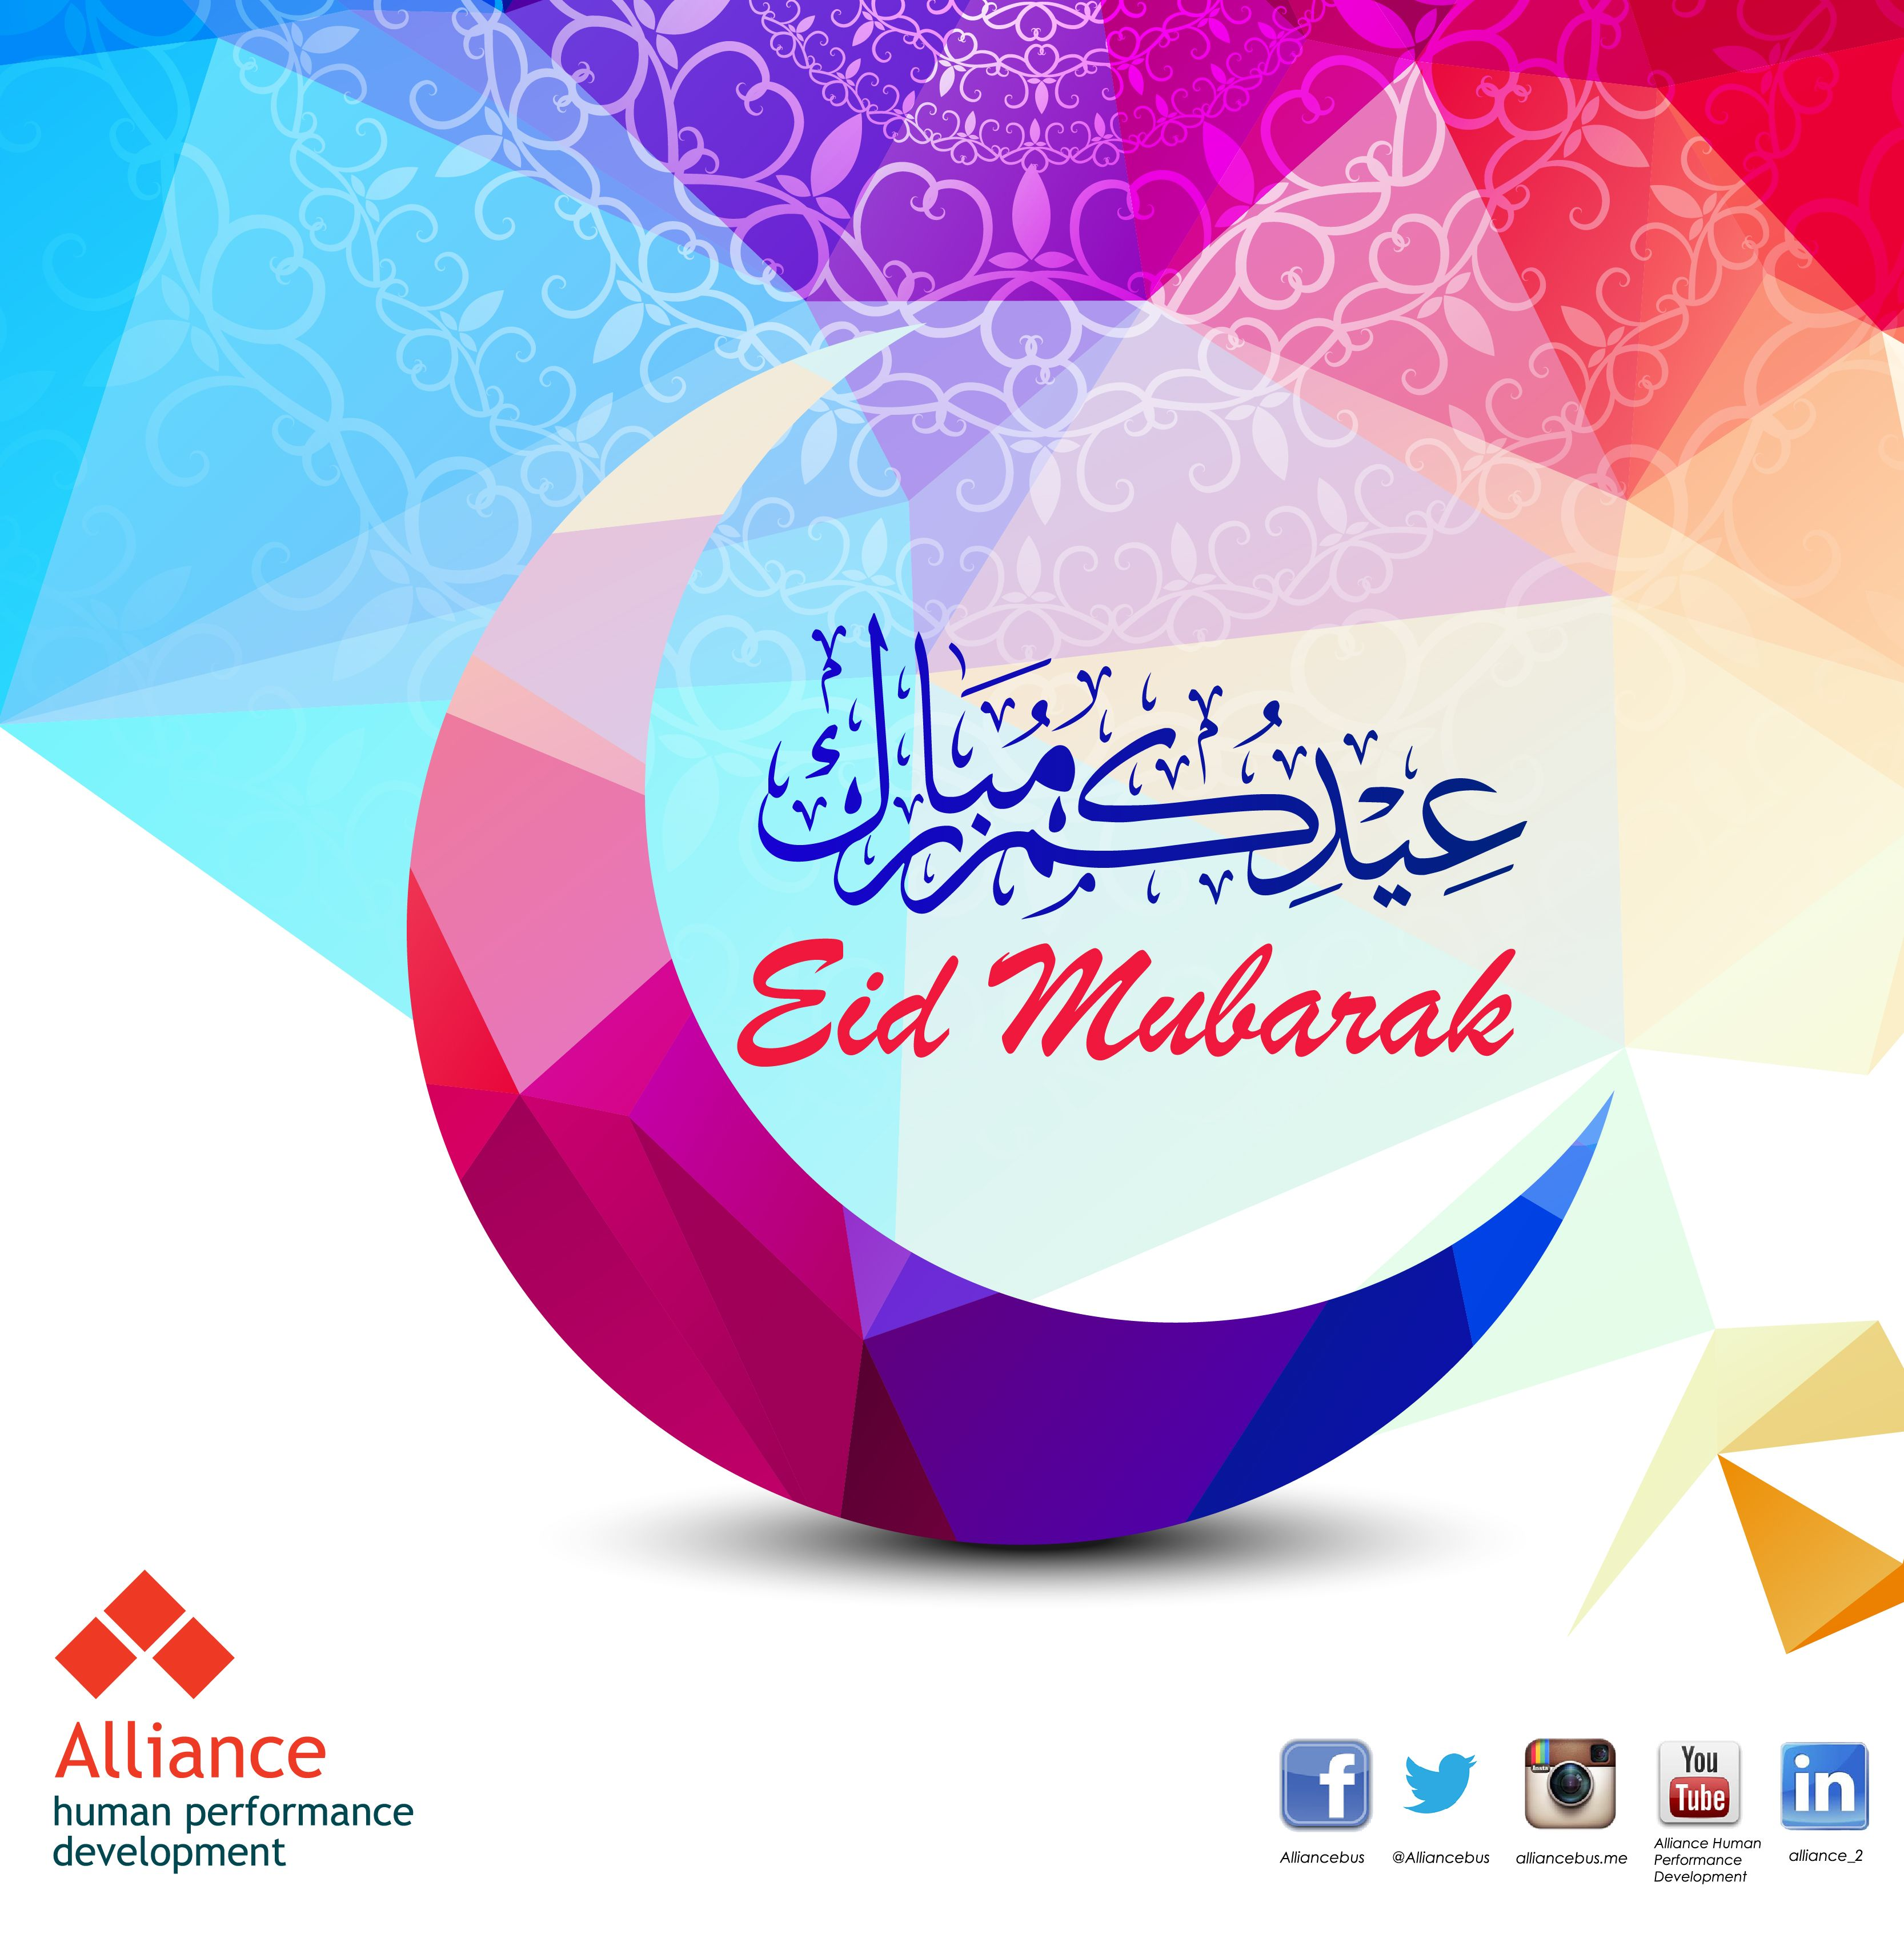 Alliance Human Performance Development Wishes You And Your Families Eid Mubarak تتمنى شركة الائتلاف للاستشارات الإدارية Eid Mubarak Human Development Alliance